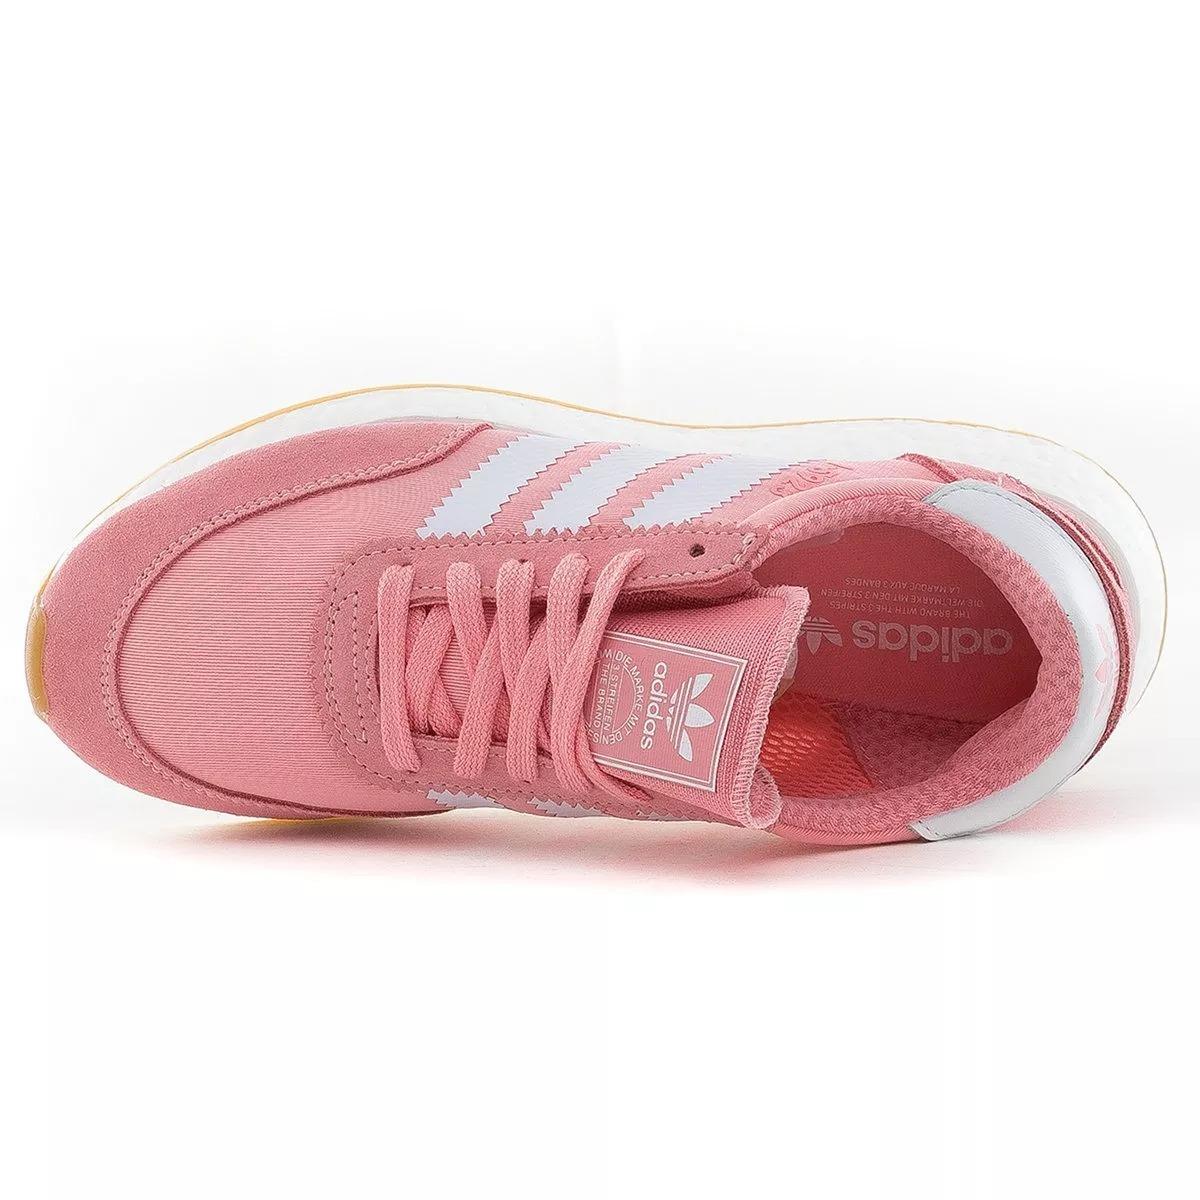 Zapatillas Iñiki I 5923 W Rosa adidas Originals